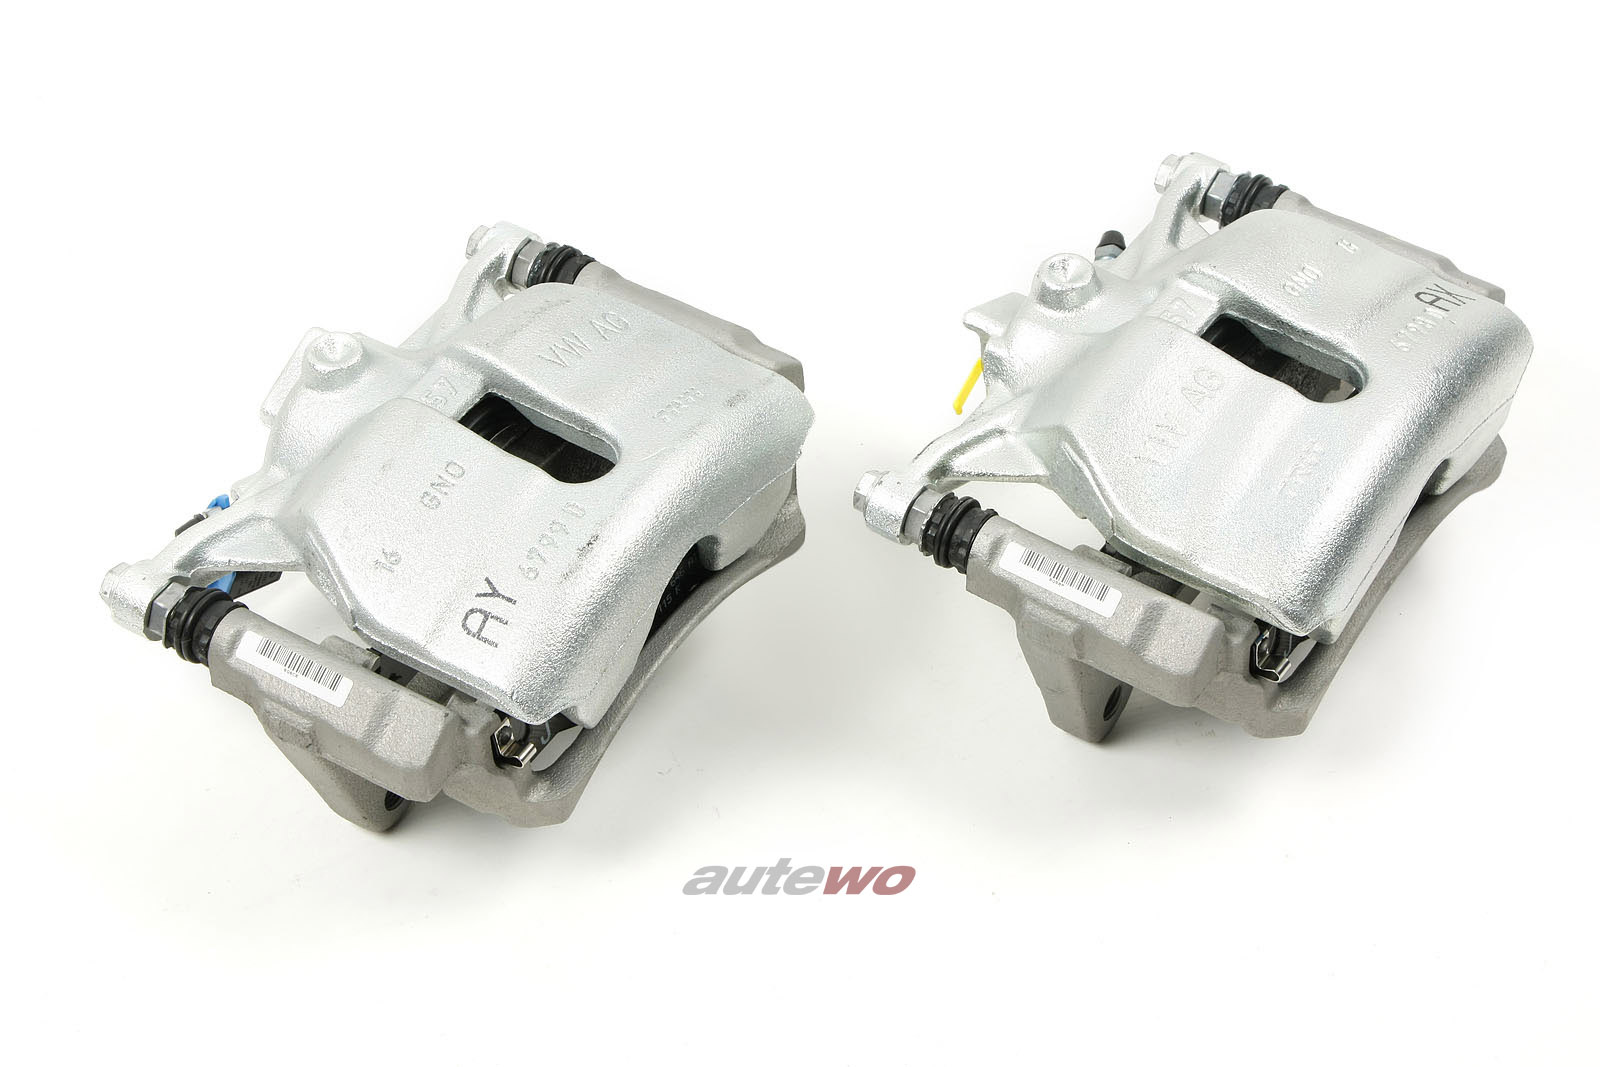 06A919081A NEU Audi A3 8Z/TT 8S Bremsanlage 312x25mm Vorne Links & Rechts